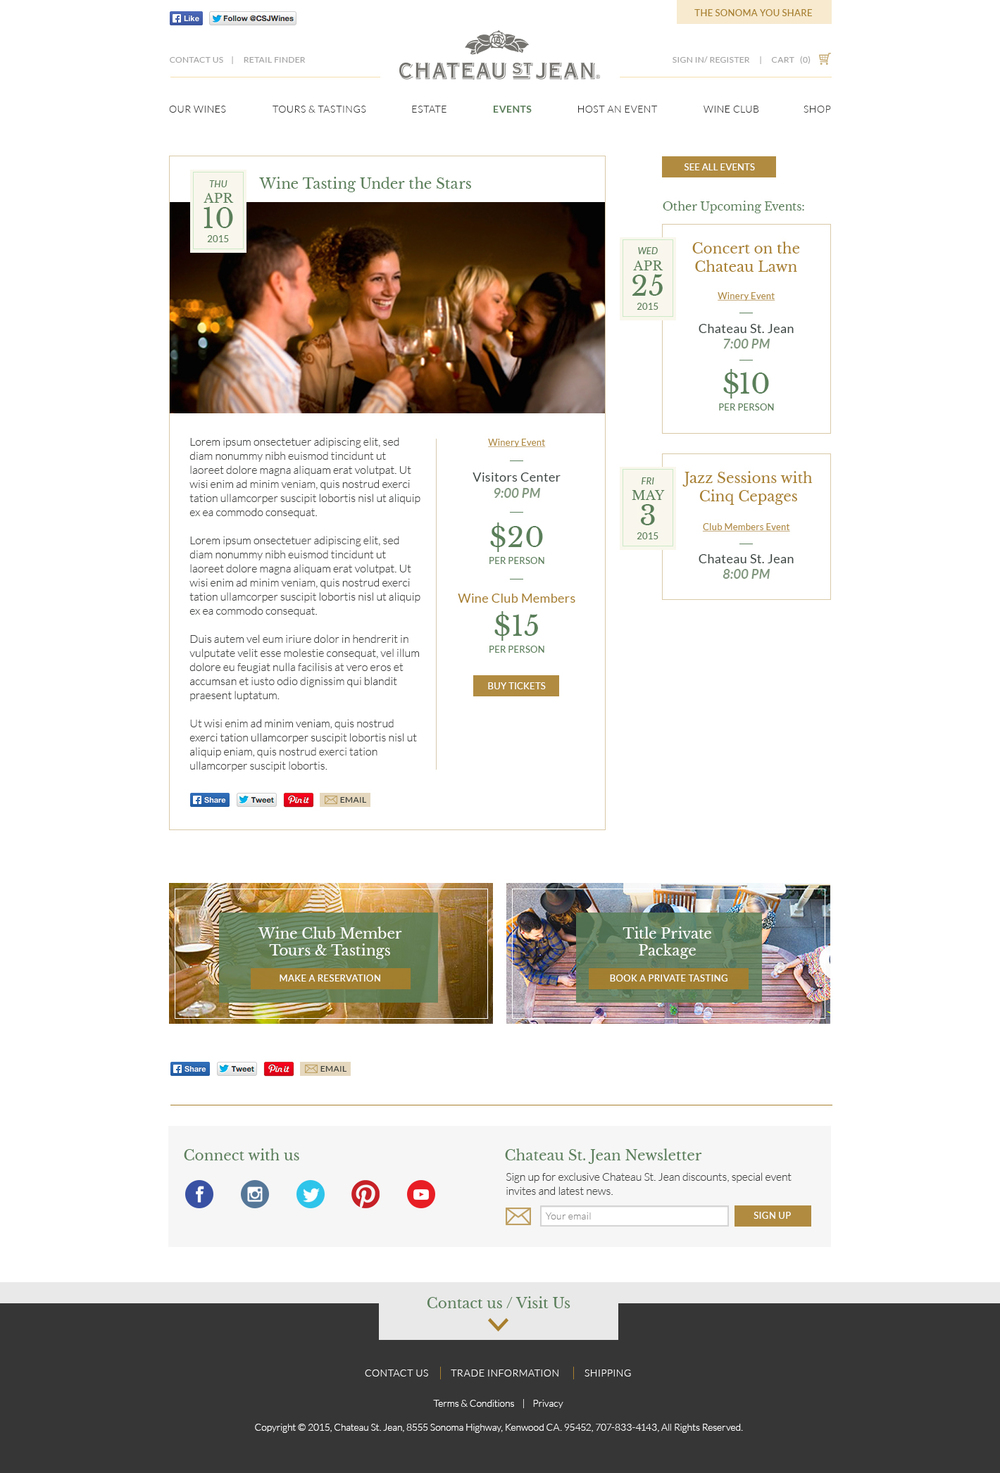 TRE01-018_CSJ-Website-Redesign_04Events_4.1EventDetail.jpg